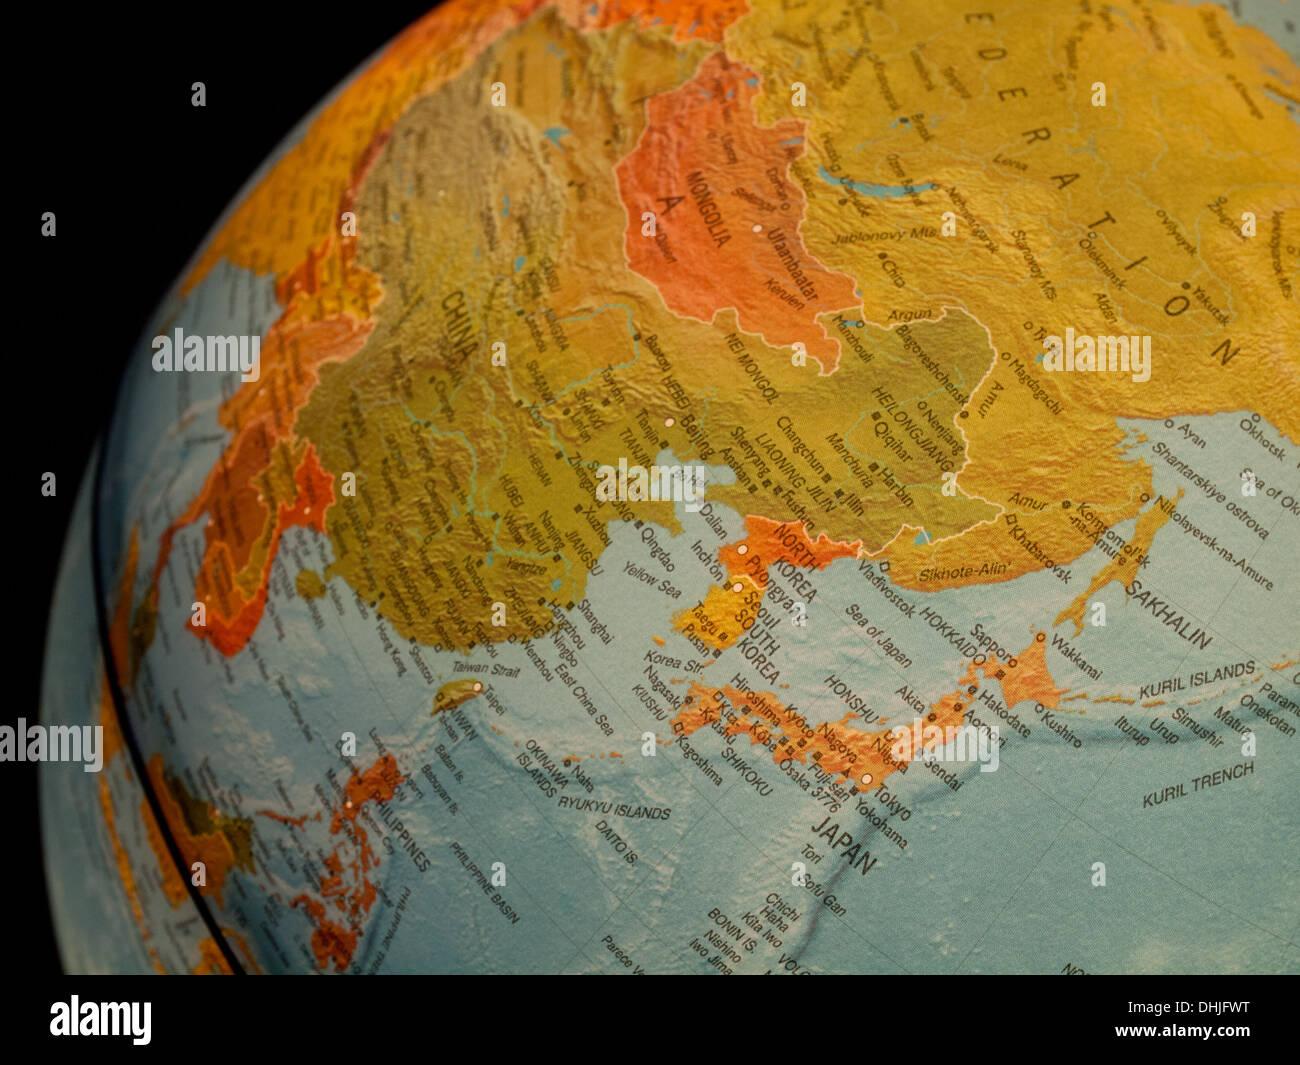 A view of japan south korea north korea and china on a beautiful a view of japan south korea north korea and china on a beautiful illuminated globe gumiabroncs Choice Image